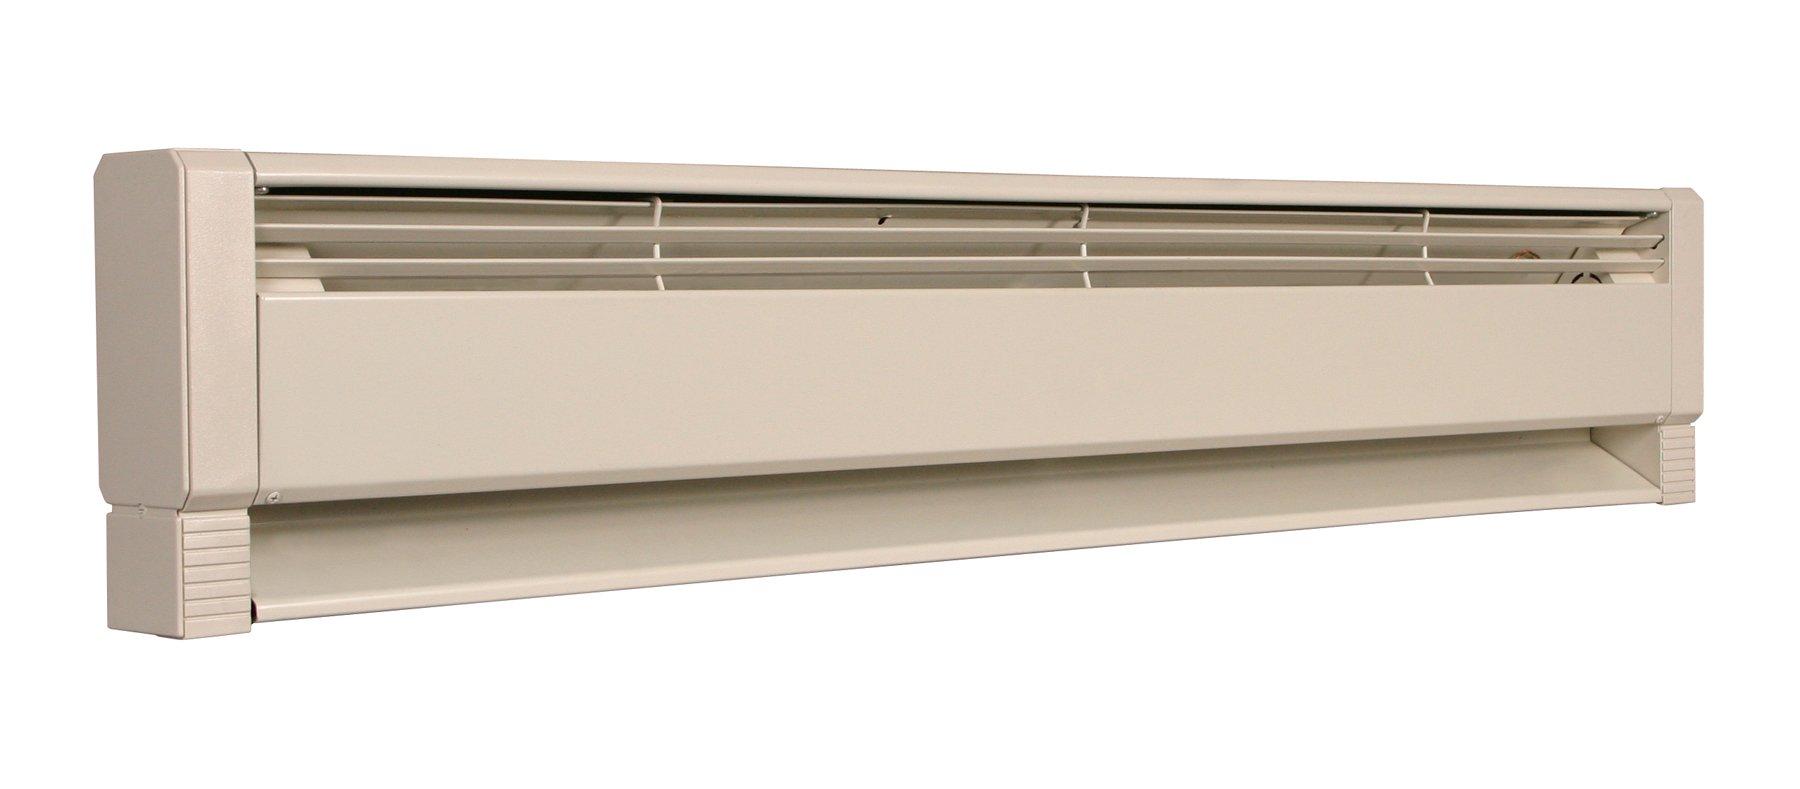 Fahrenheat PLF1004 Hydronic Baseboard 240 volt